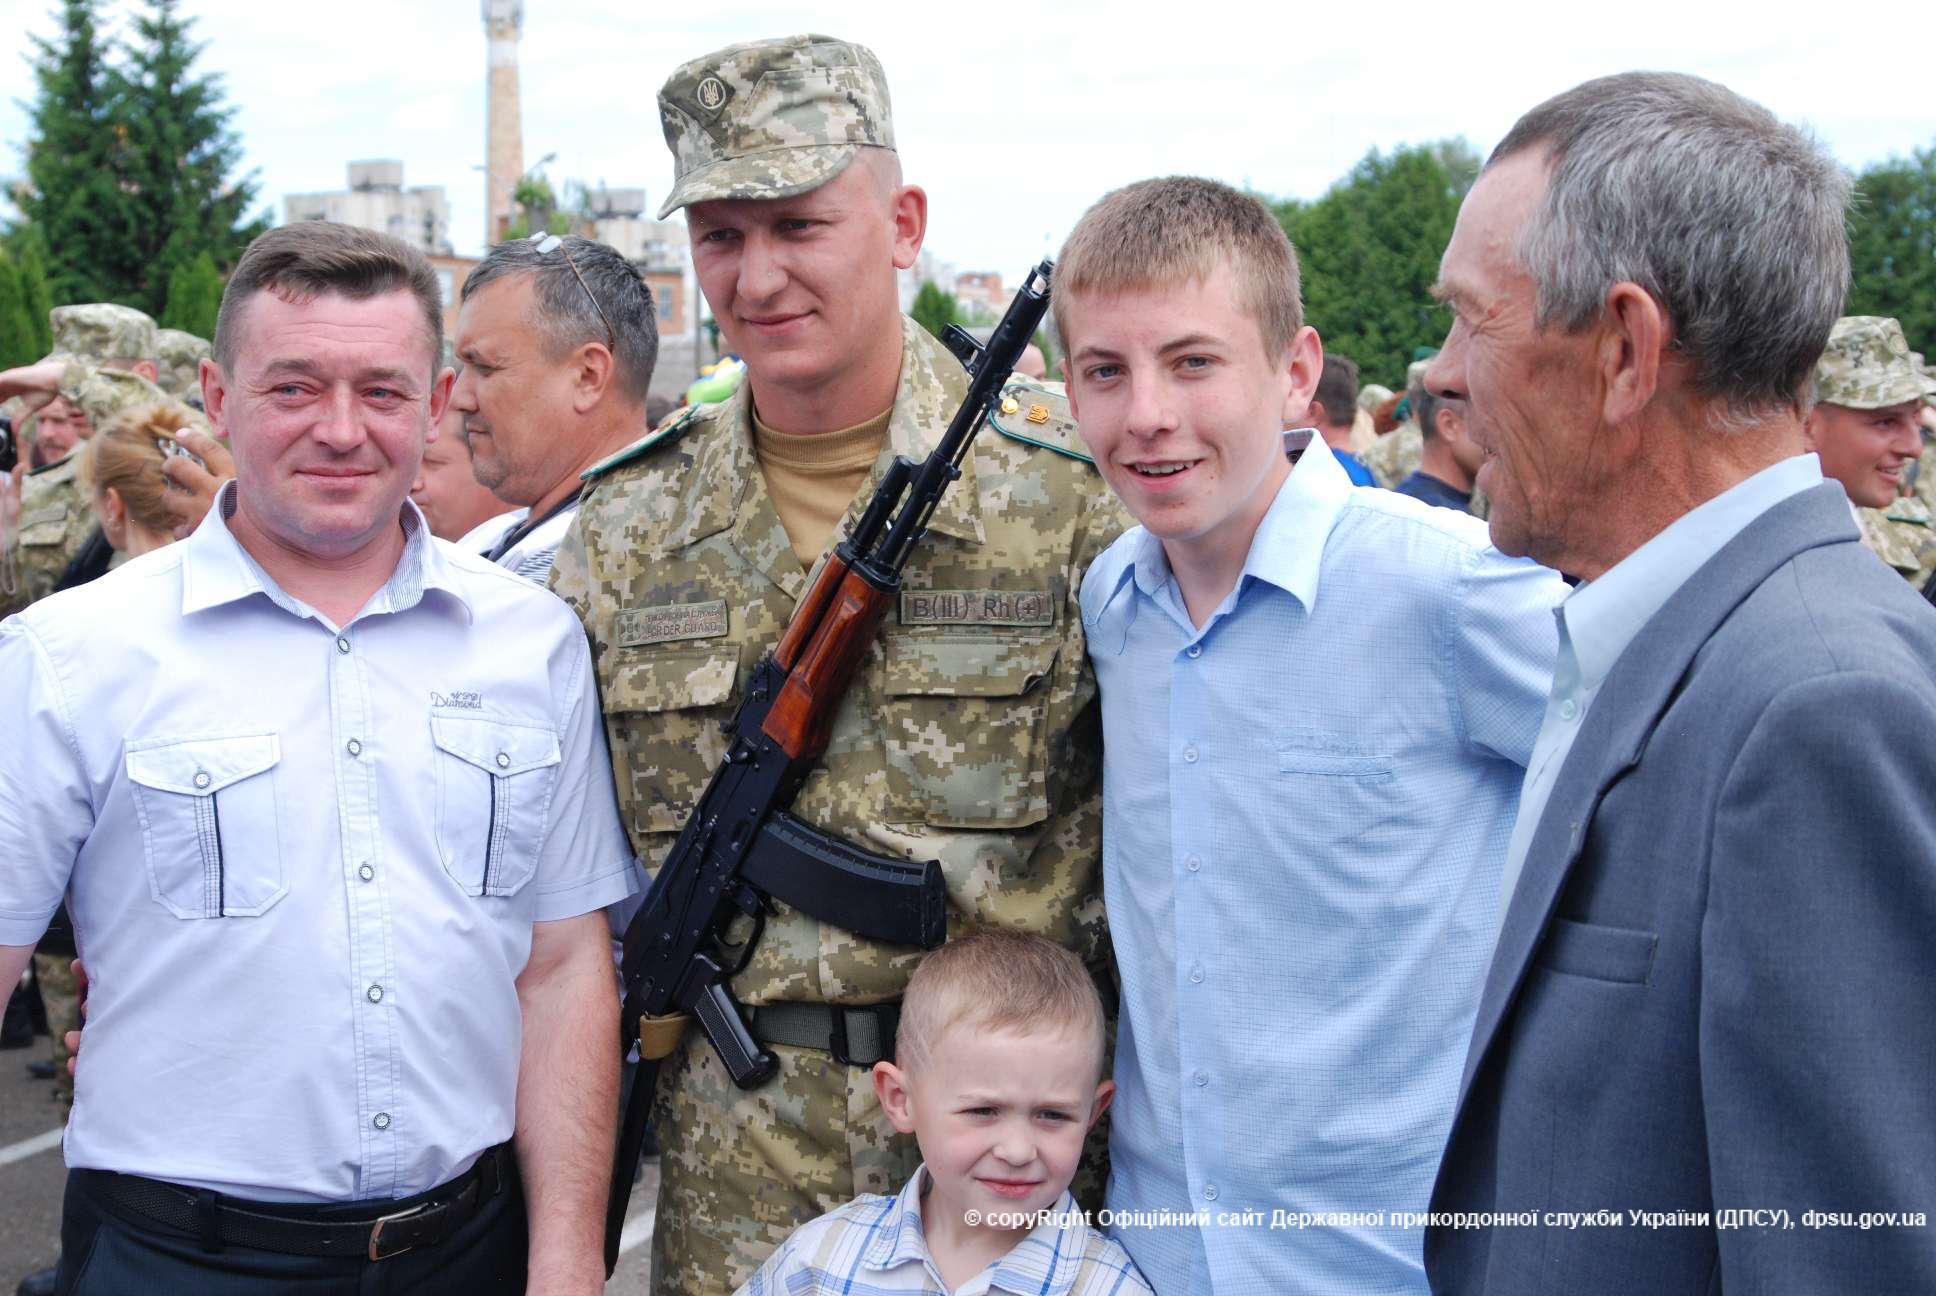 oath of allegiance to the ukrainian people